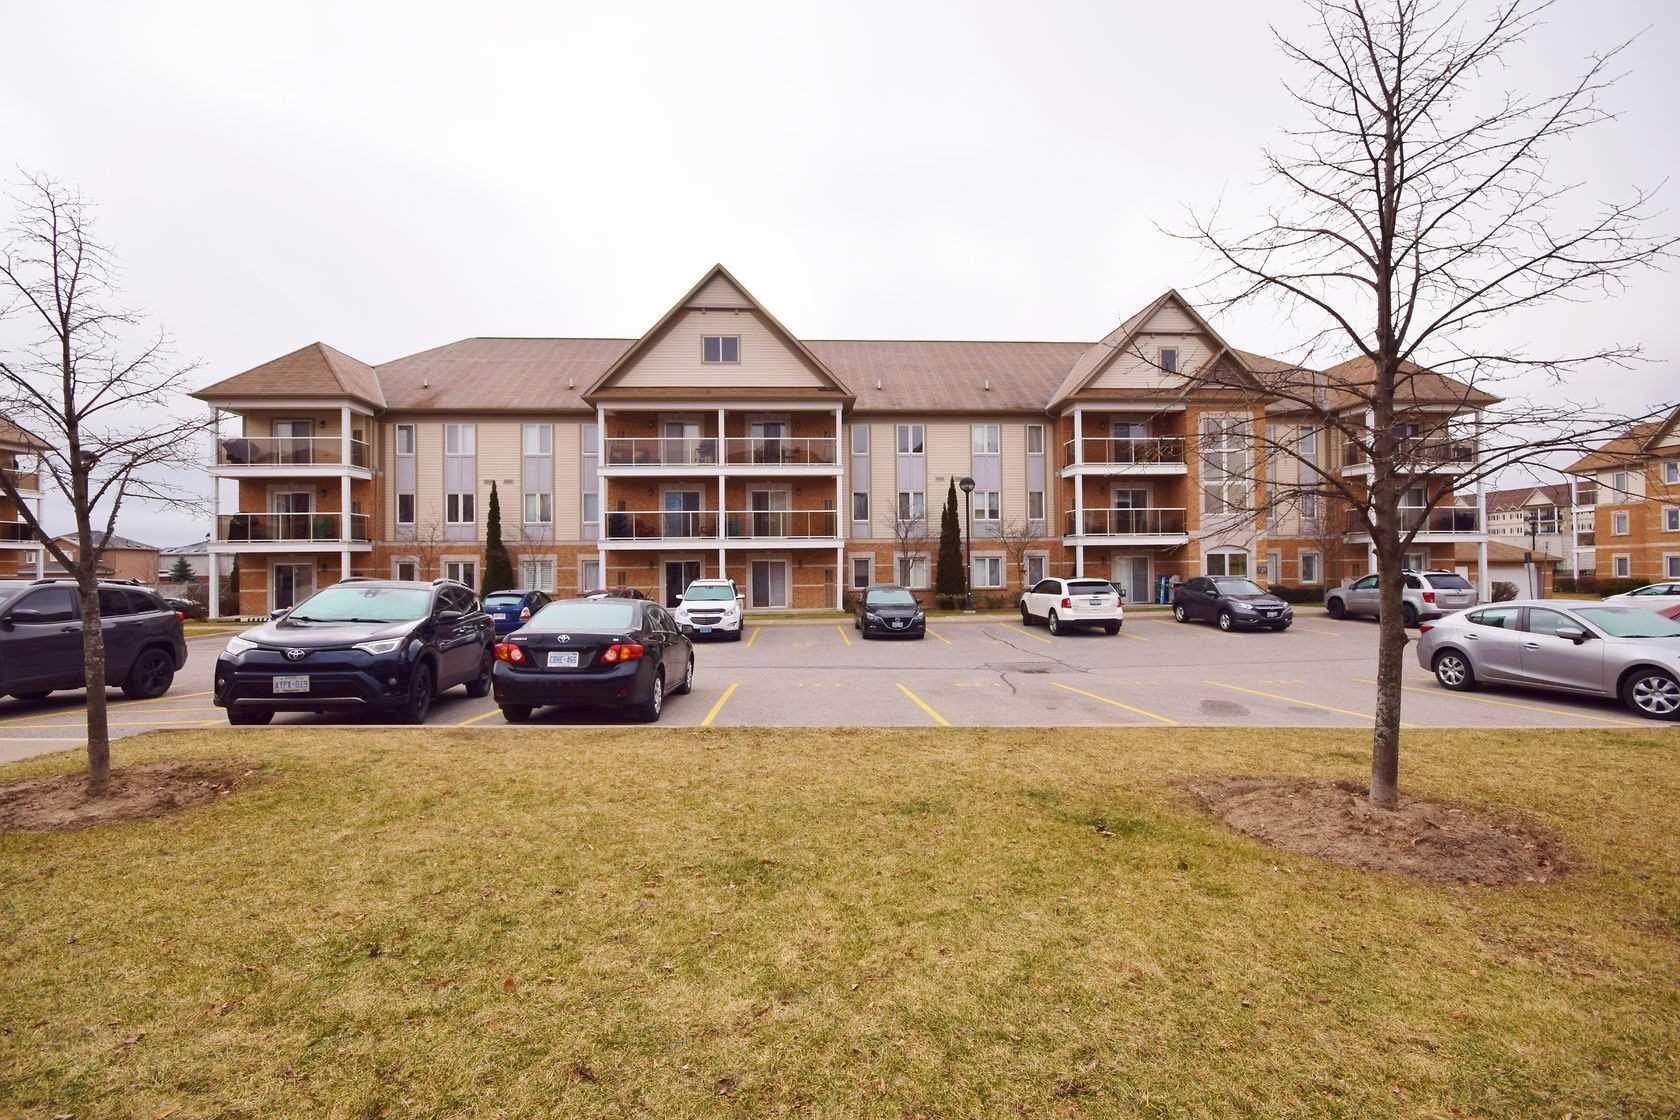 House for sale at 307-136 Aspen Springs Drive Clarington Ontario - MLS: E4329053